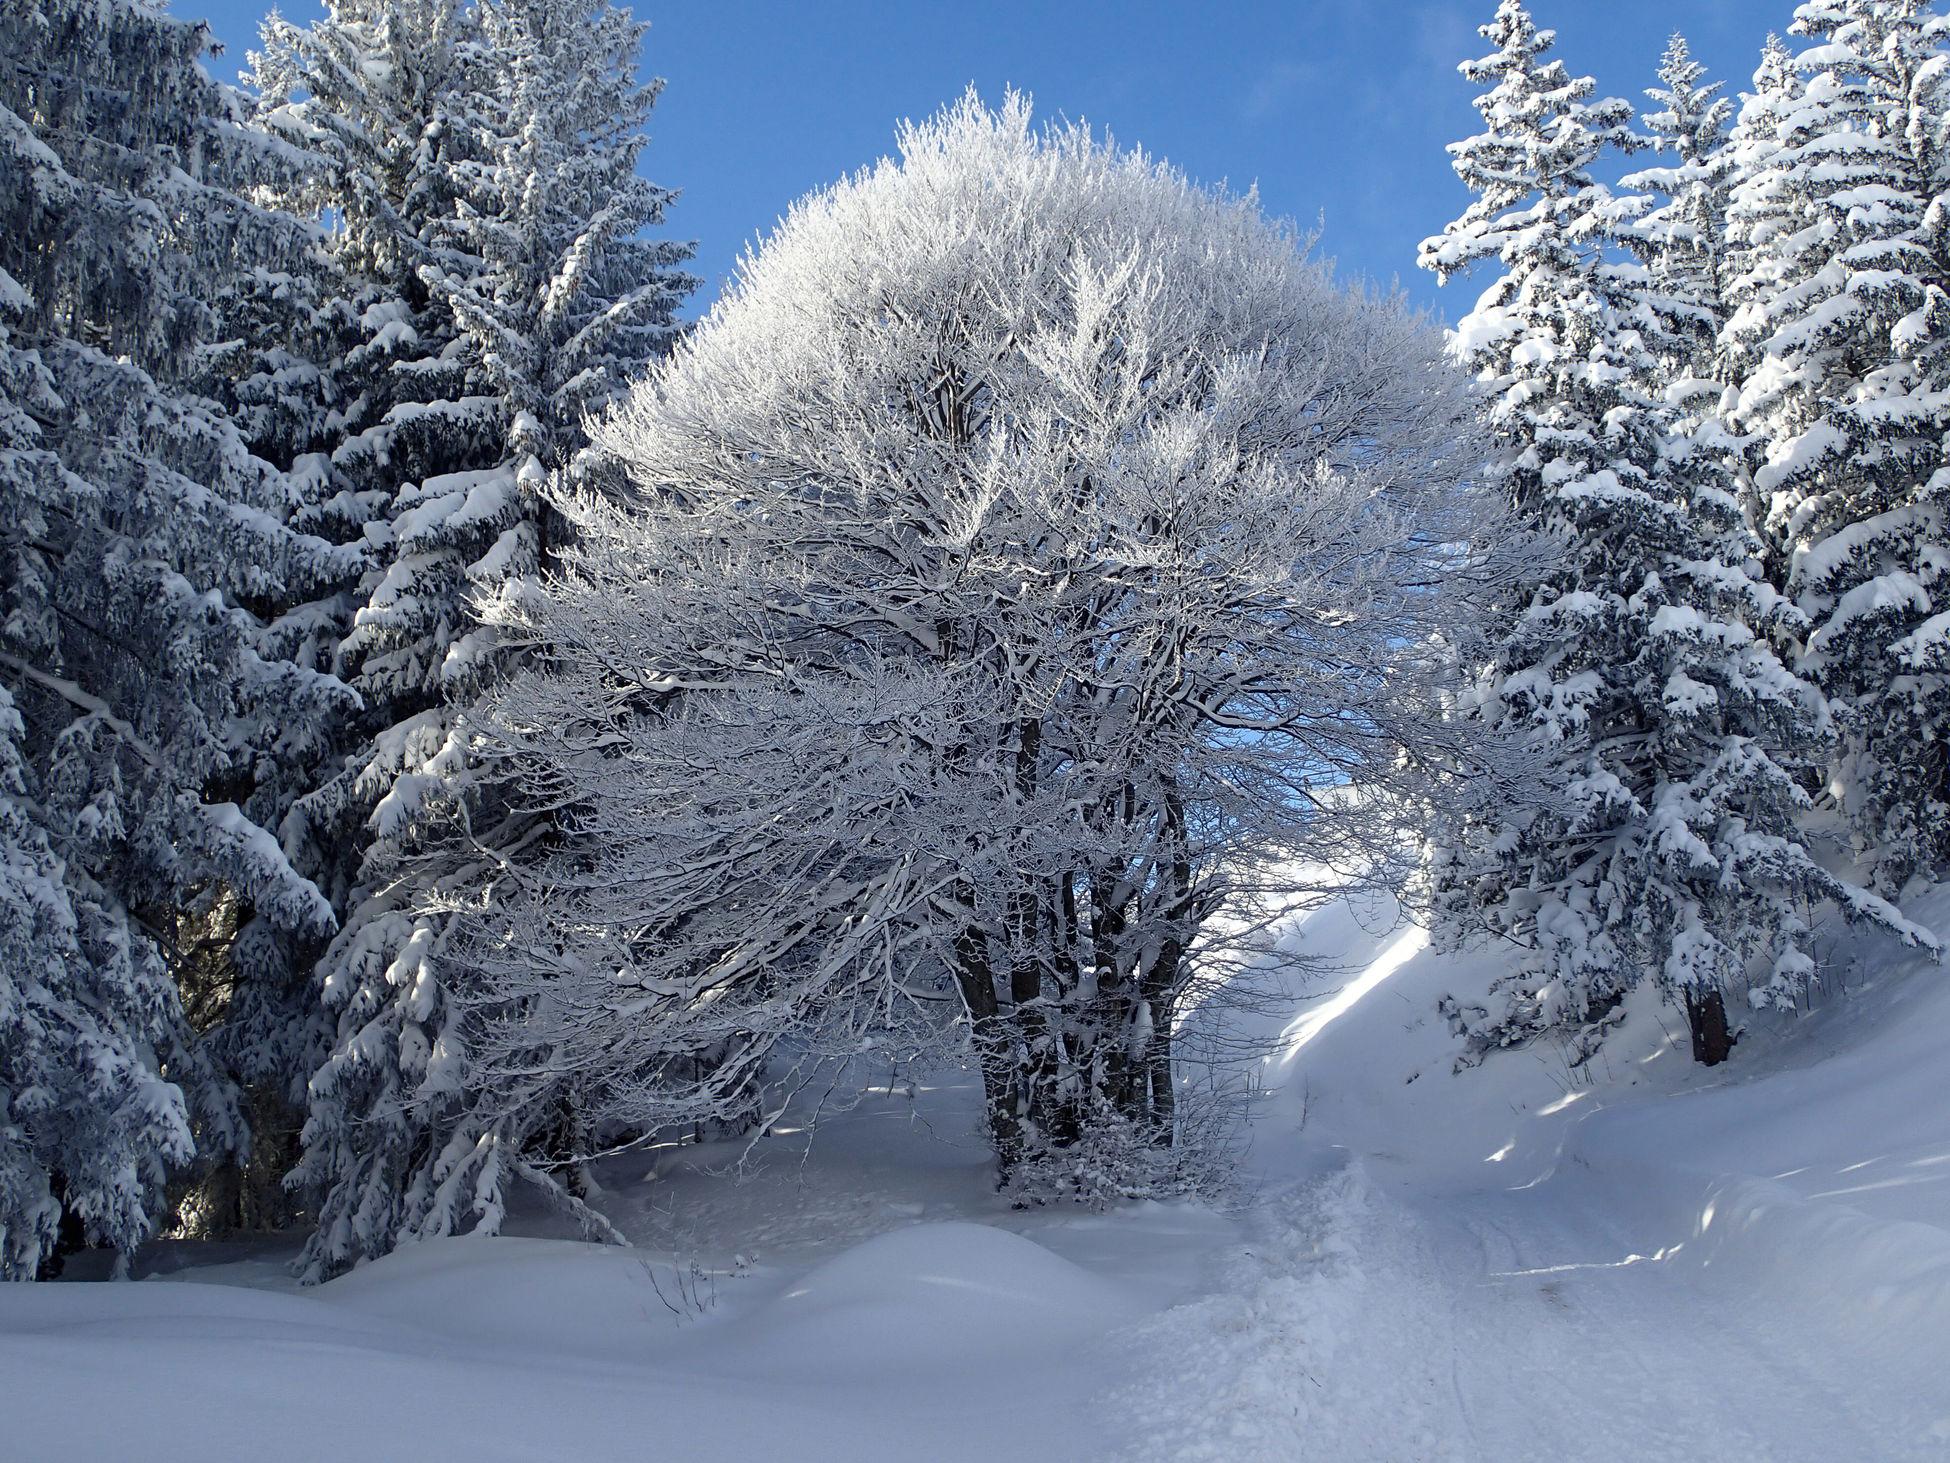 Snow Cold Temperature Winter Tree Nature Beauty In Nature Outdoors Hoher Kranzberg Tree With Snow Bäume Baum Mit Schnee EyeEmNewHere Olympus TG-2 Bavaria Bayern Deutschland Mountain Winter Wonderland Winter Trees